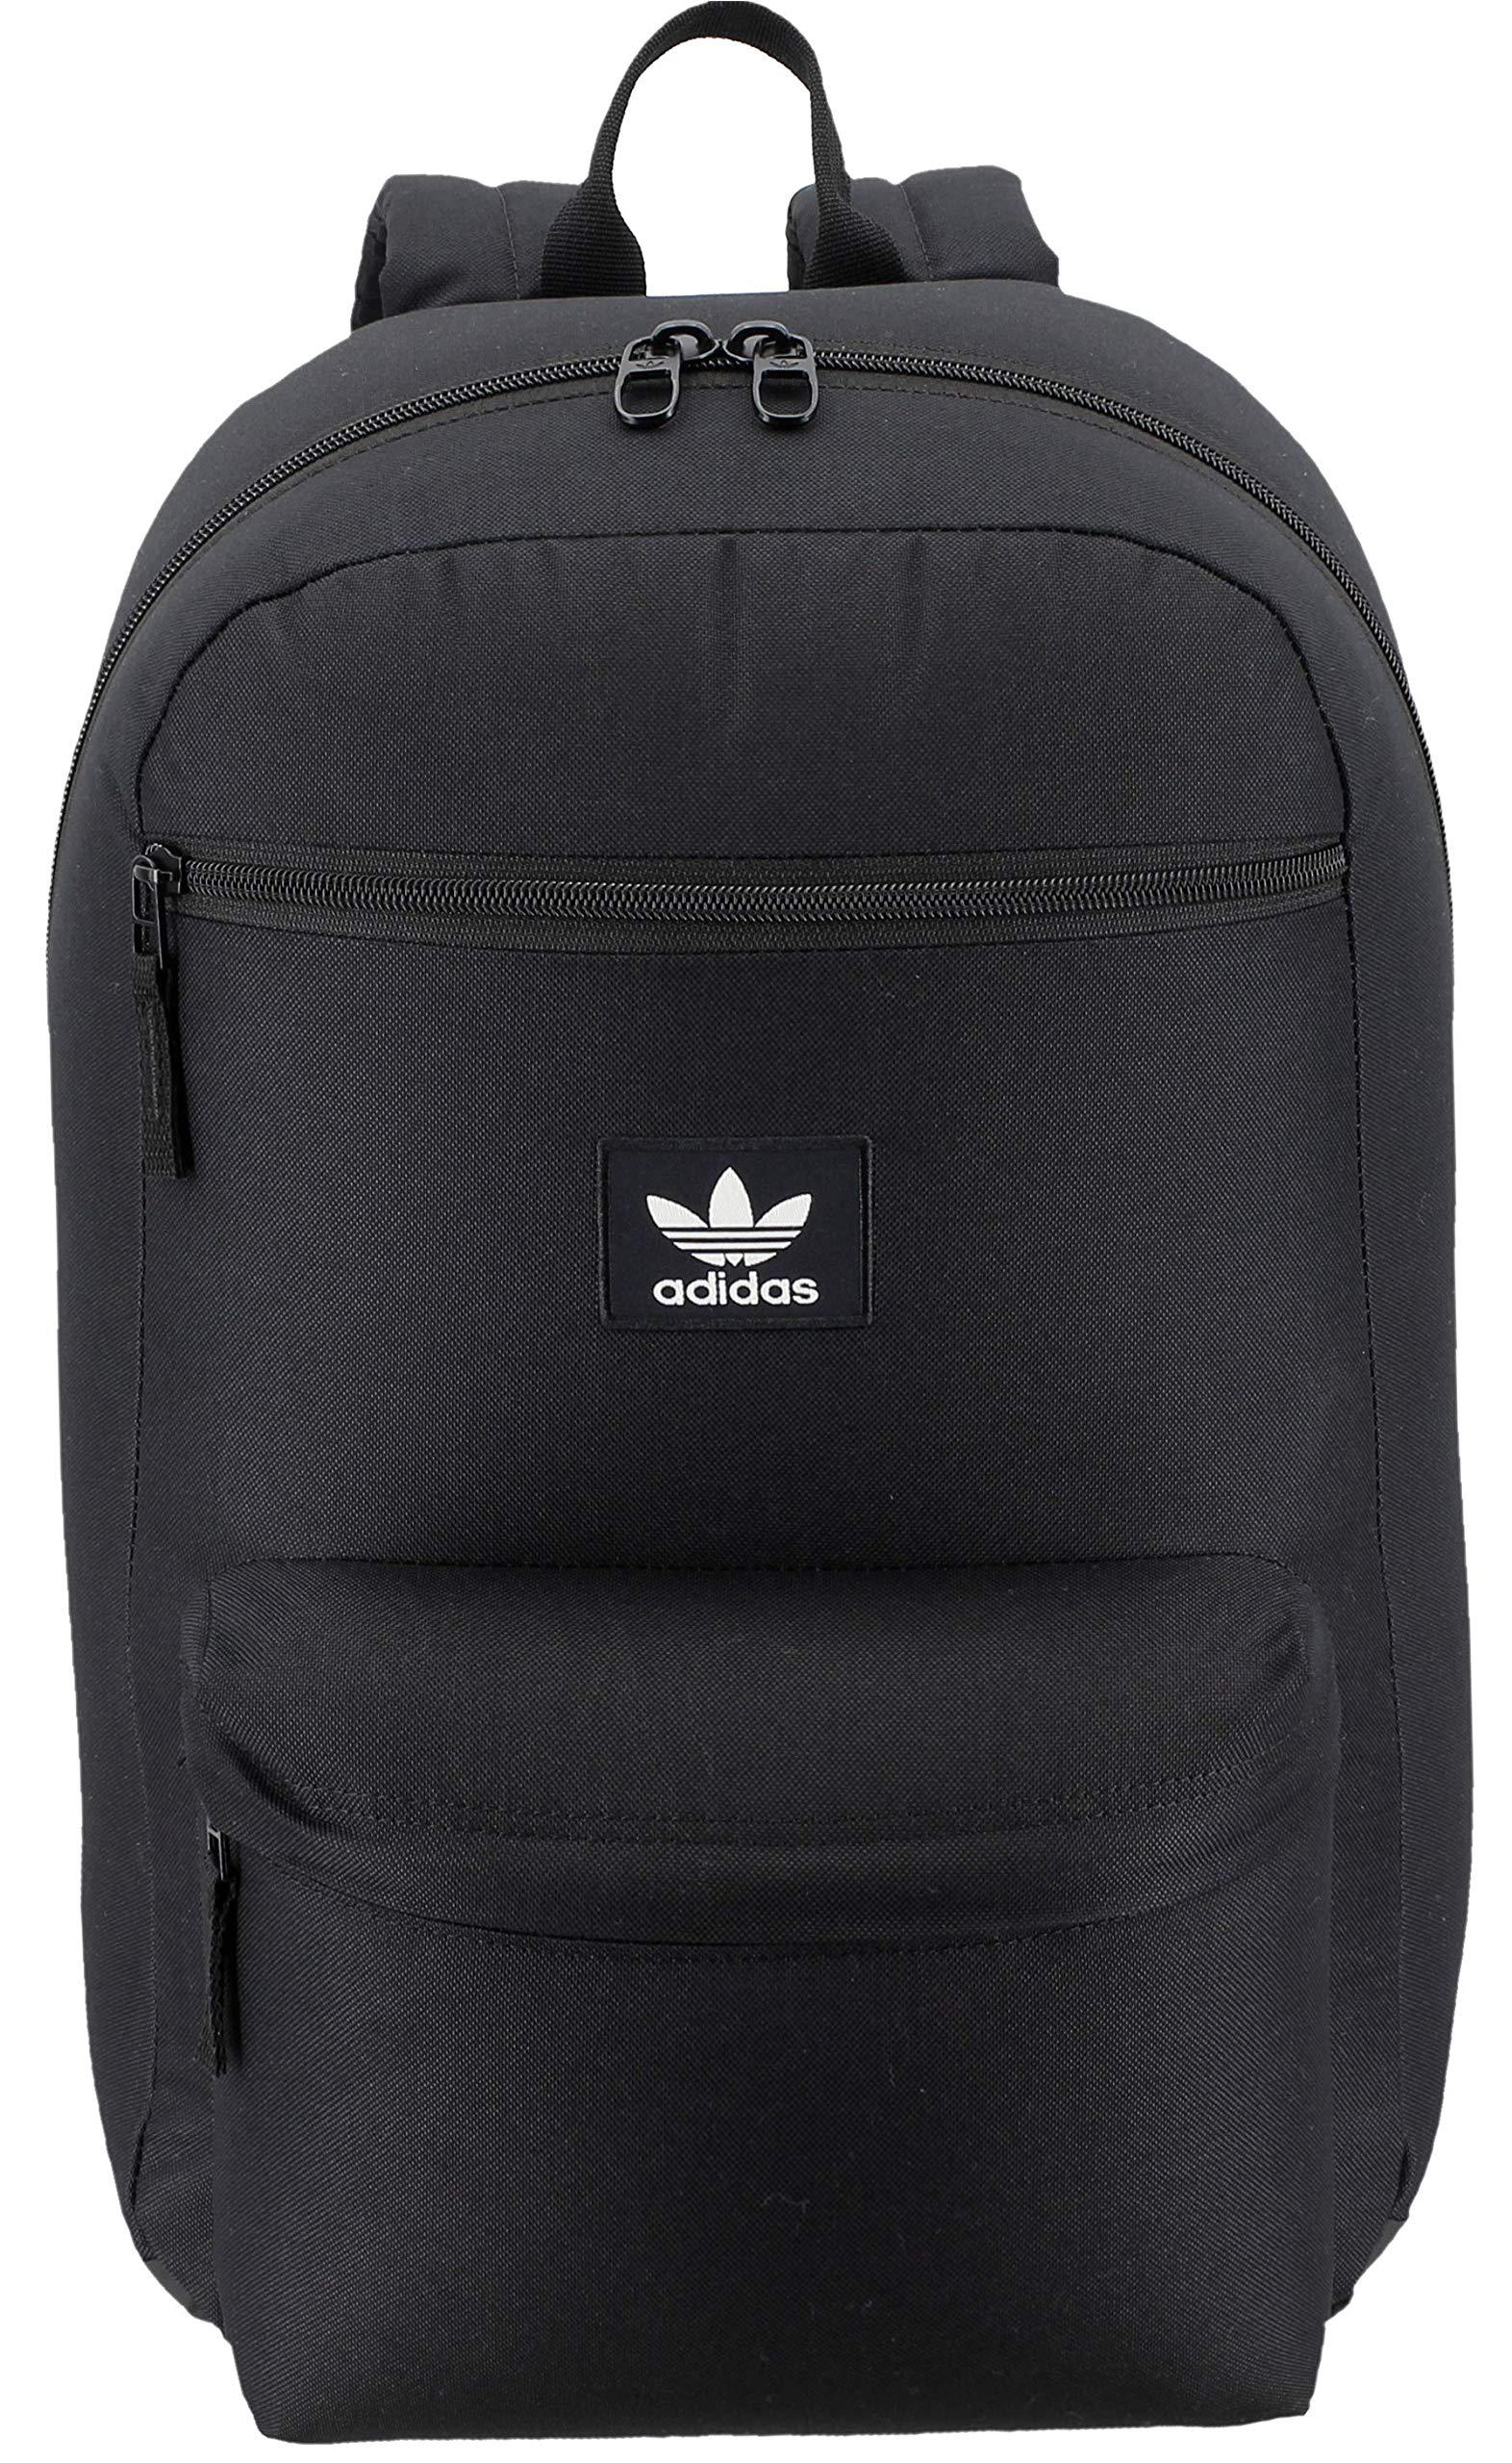 adidas Originals National Backpack Black